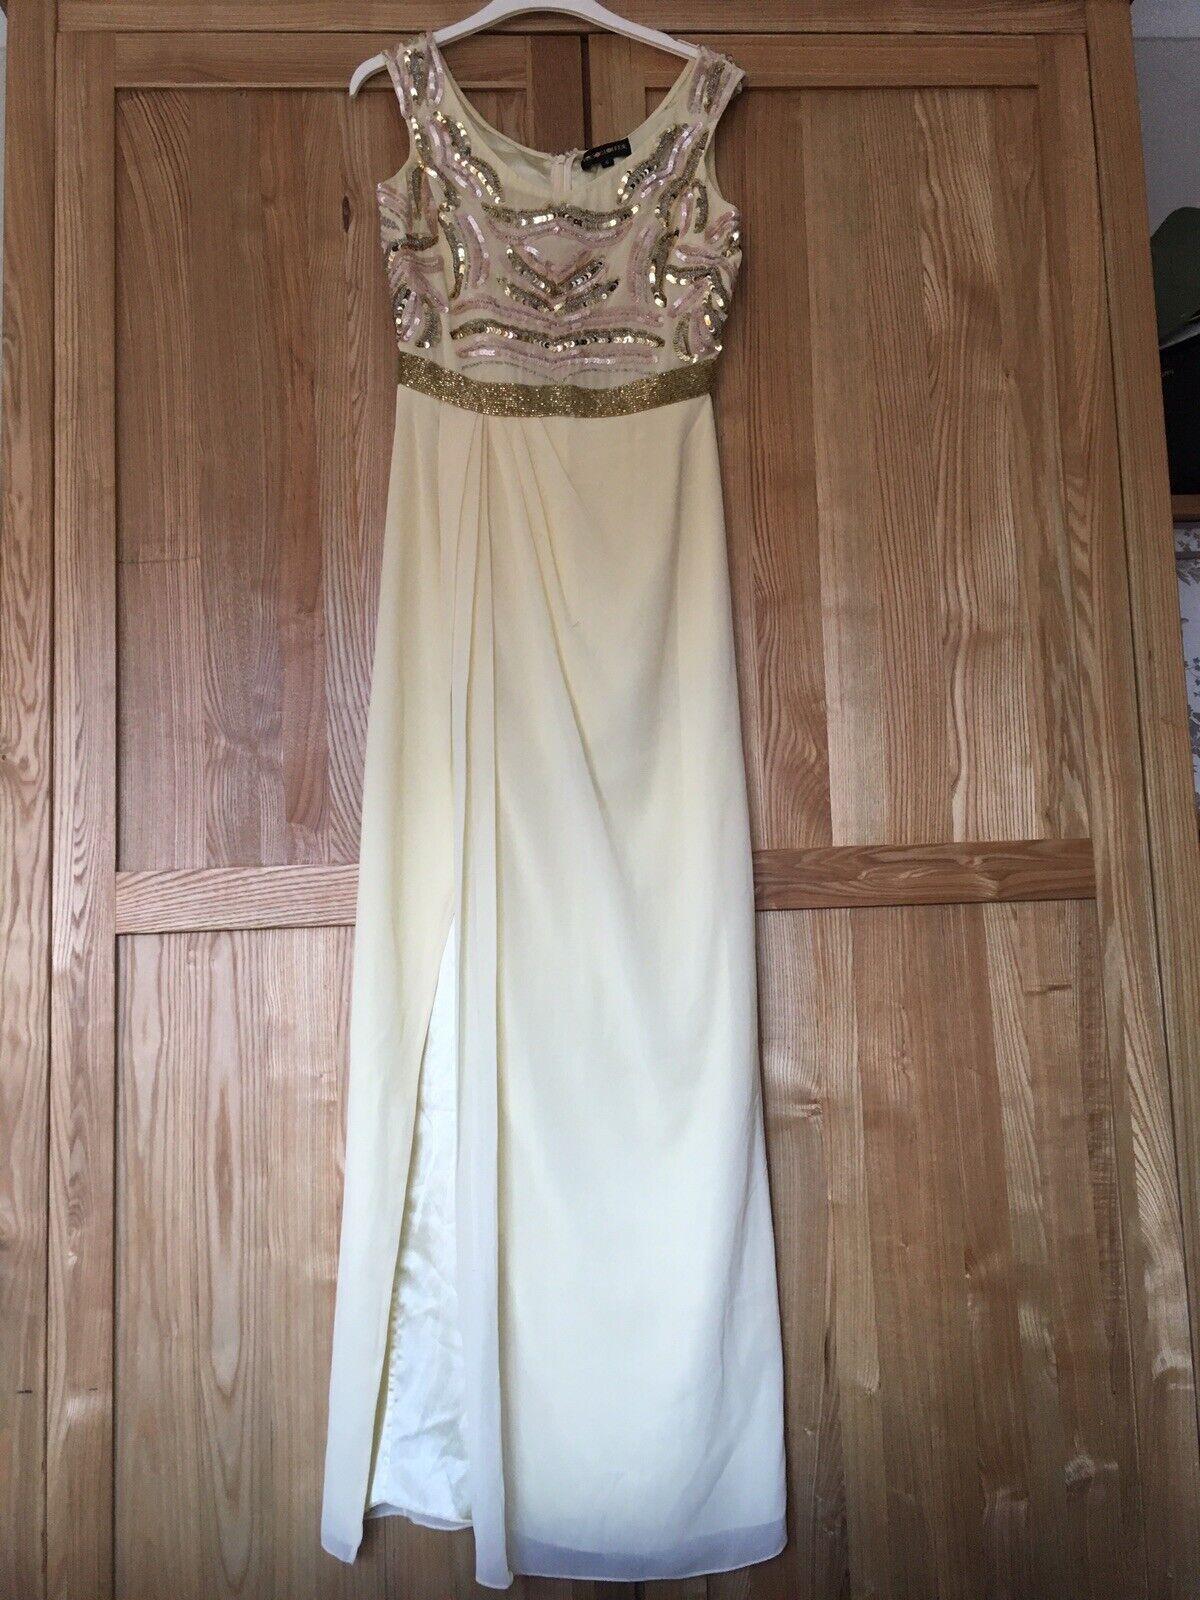 Virgos lounge Asos Gelb Sequin Dress 6 Prom Bridesmaid RRP